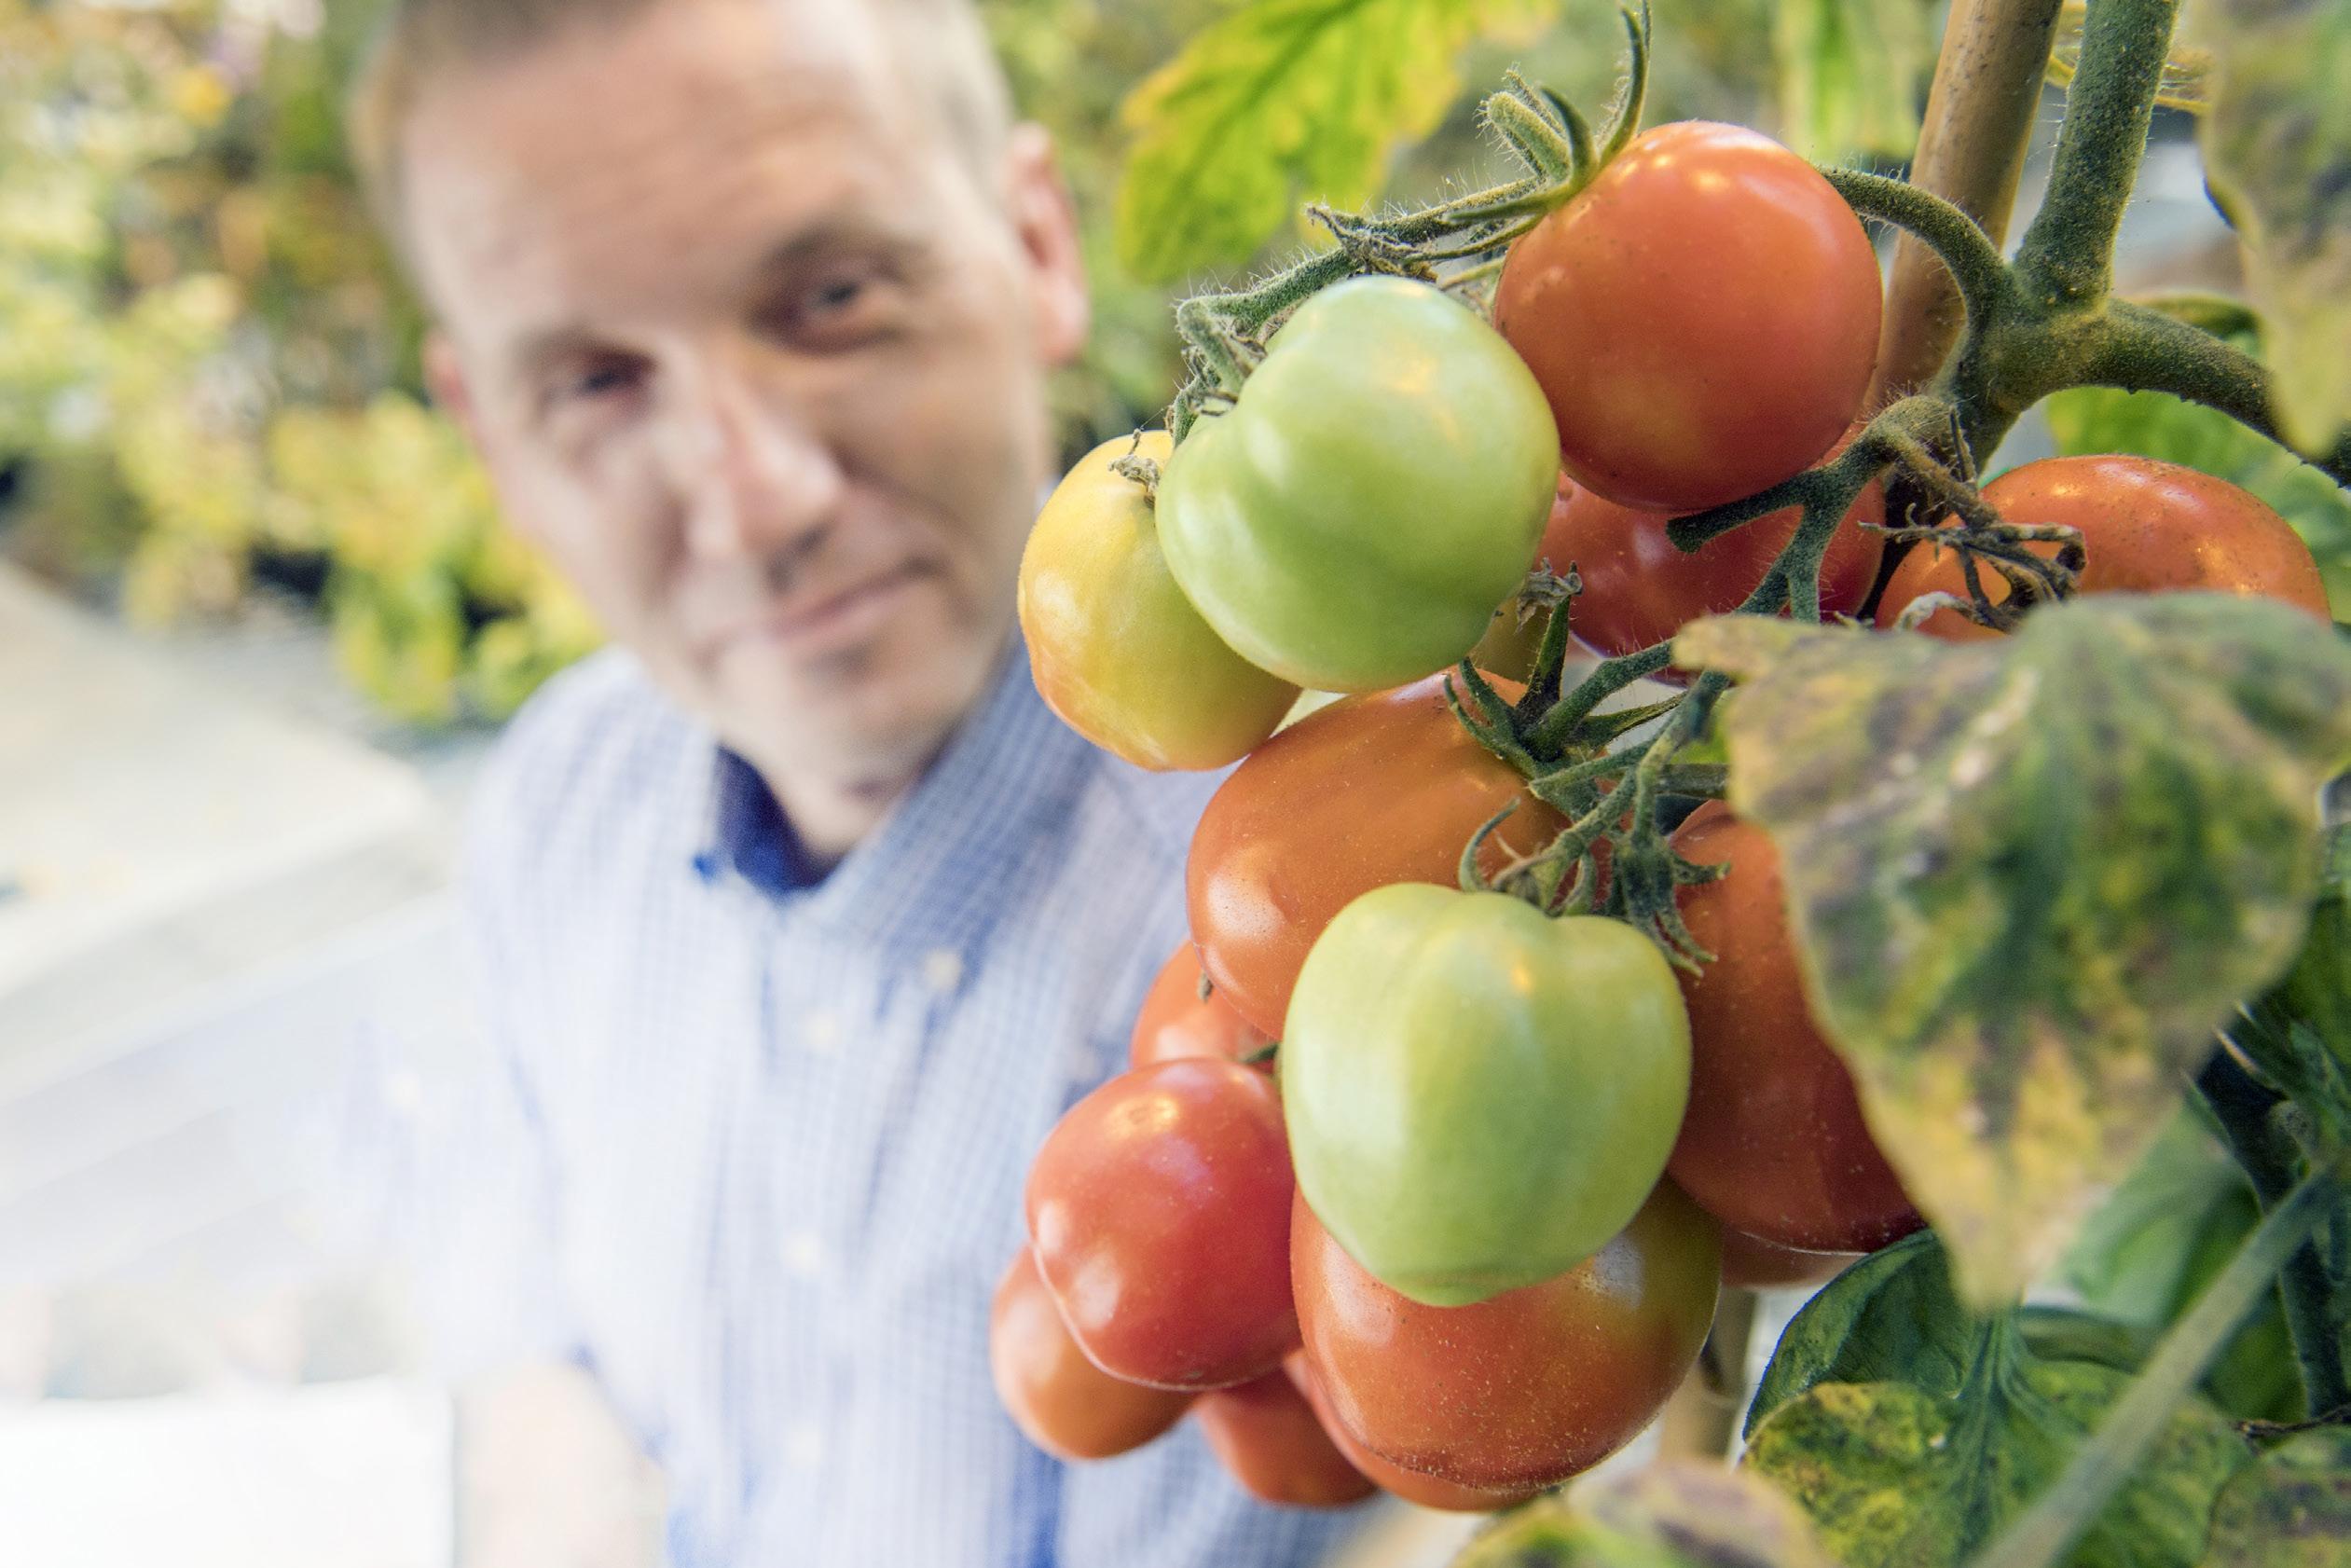 Michael Gutensohn looking at tomatoes.